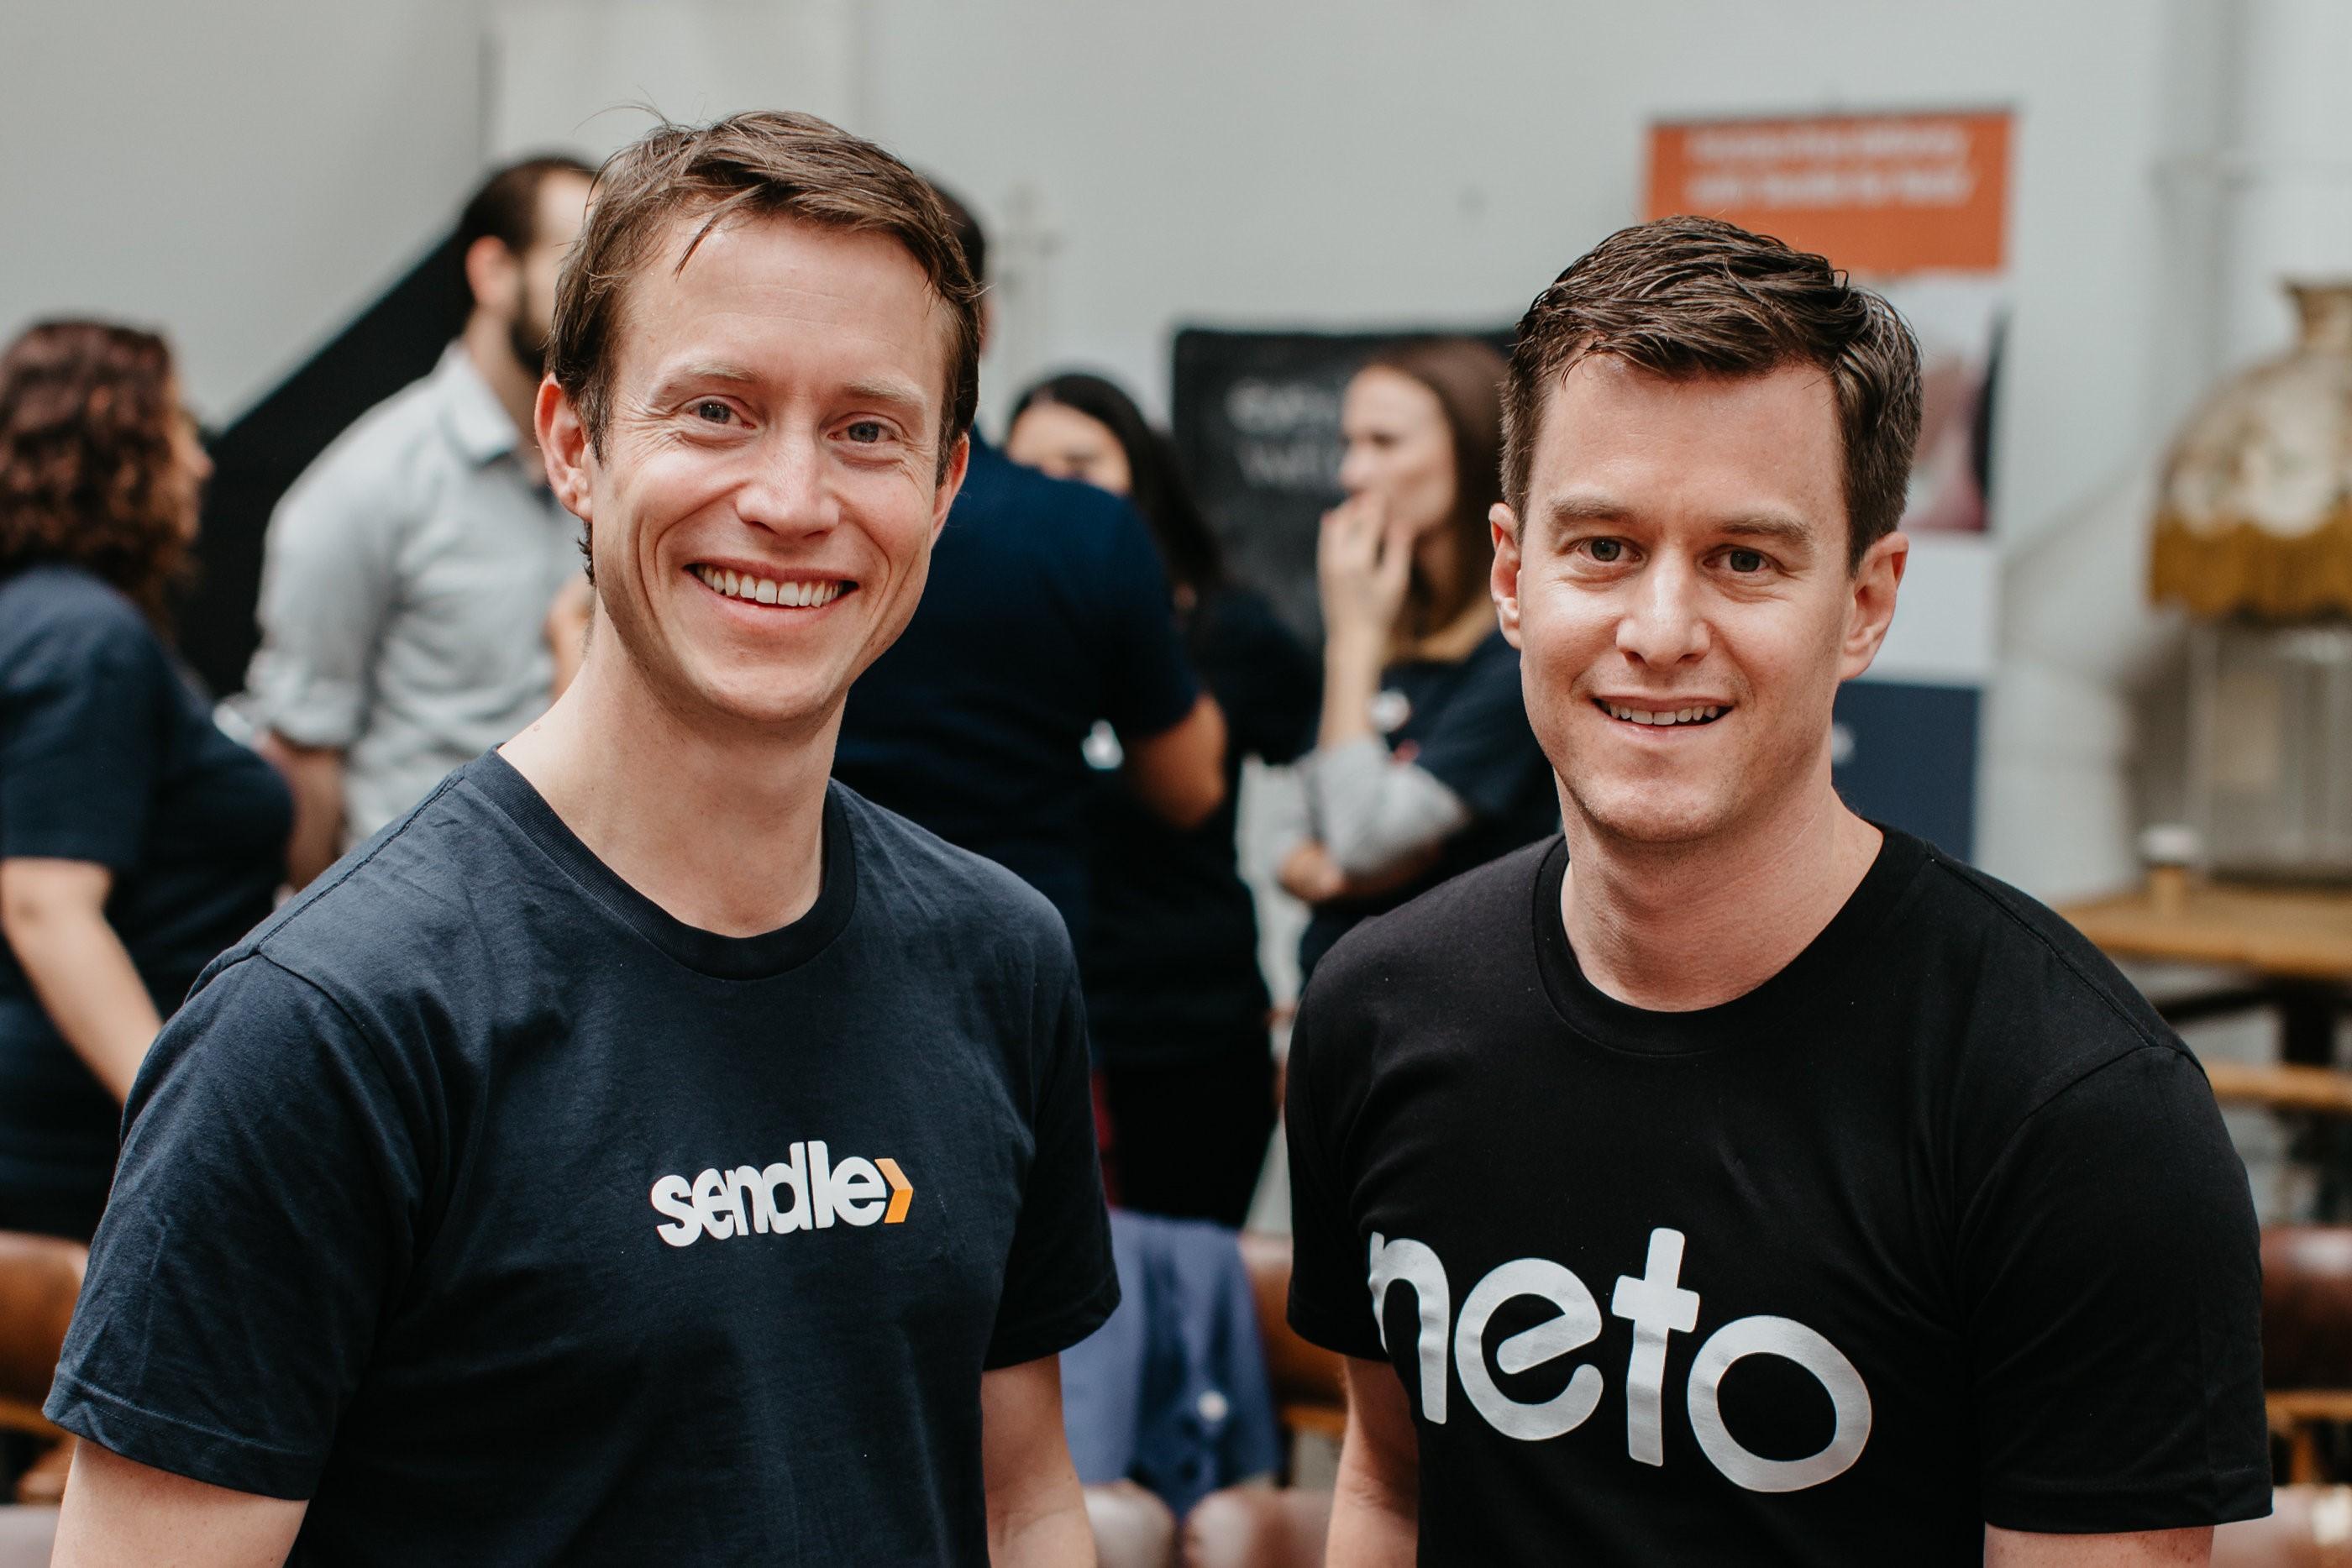 Neto and Sendle team up